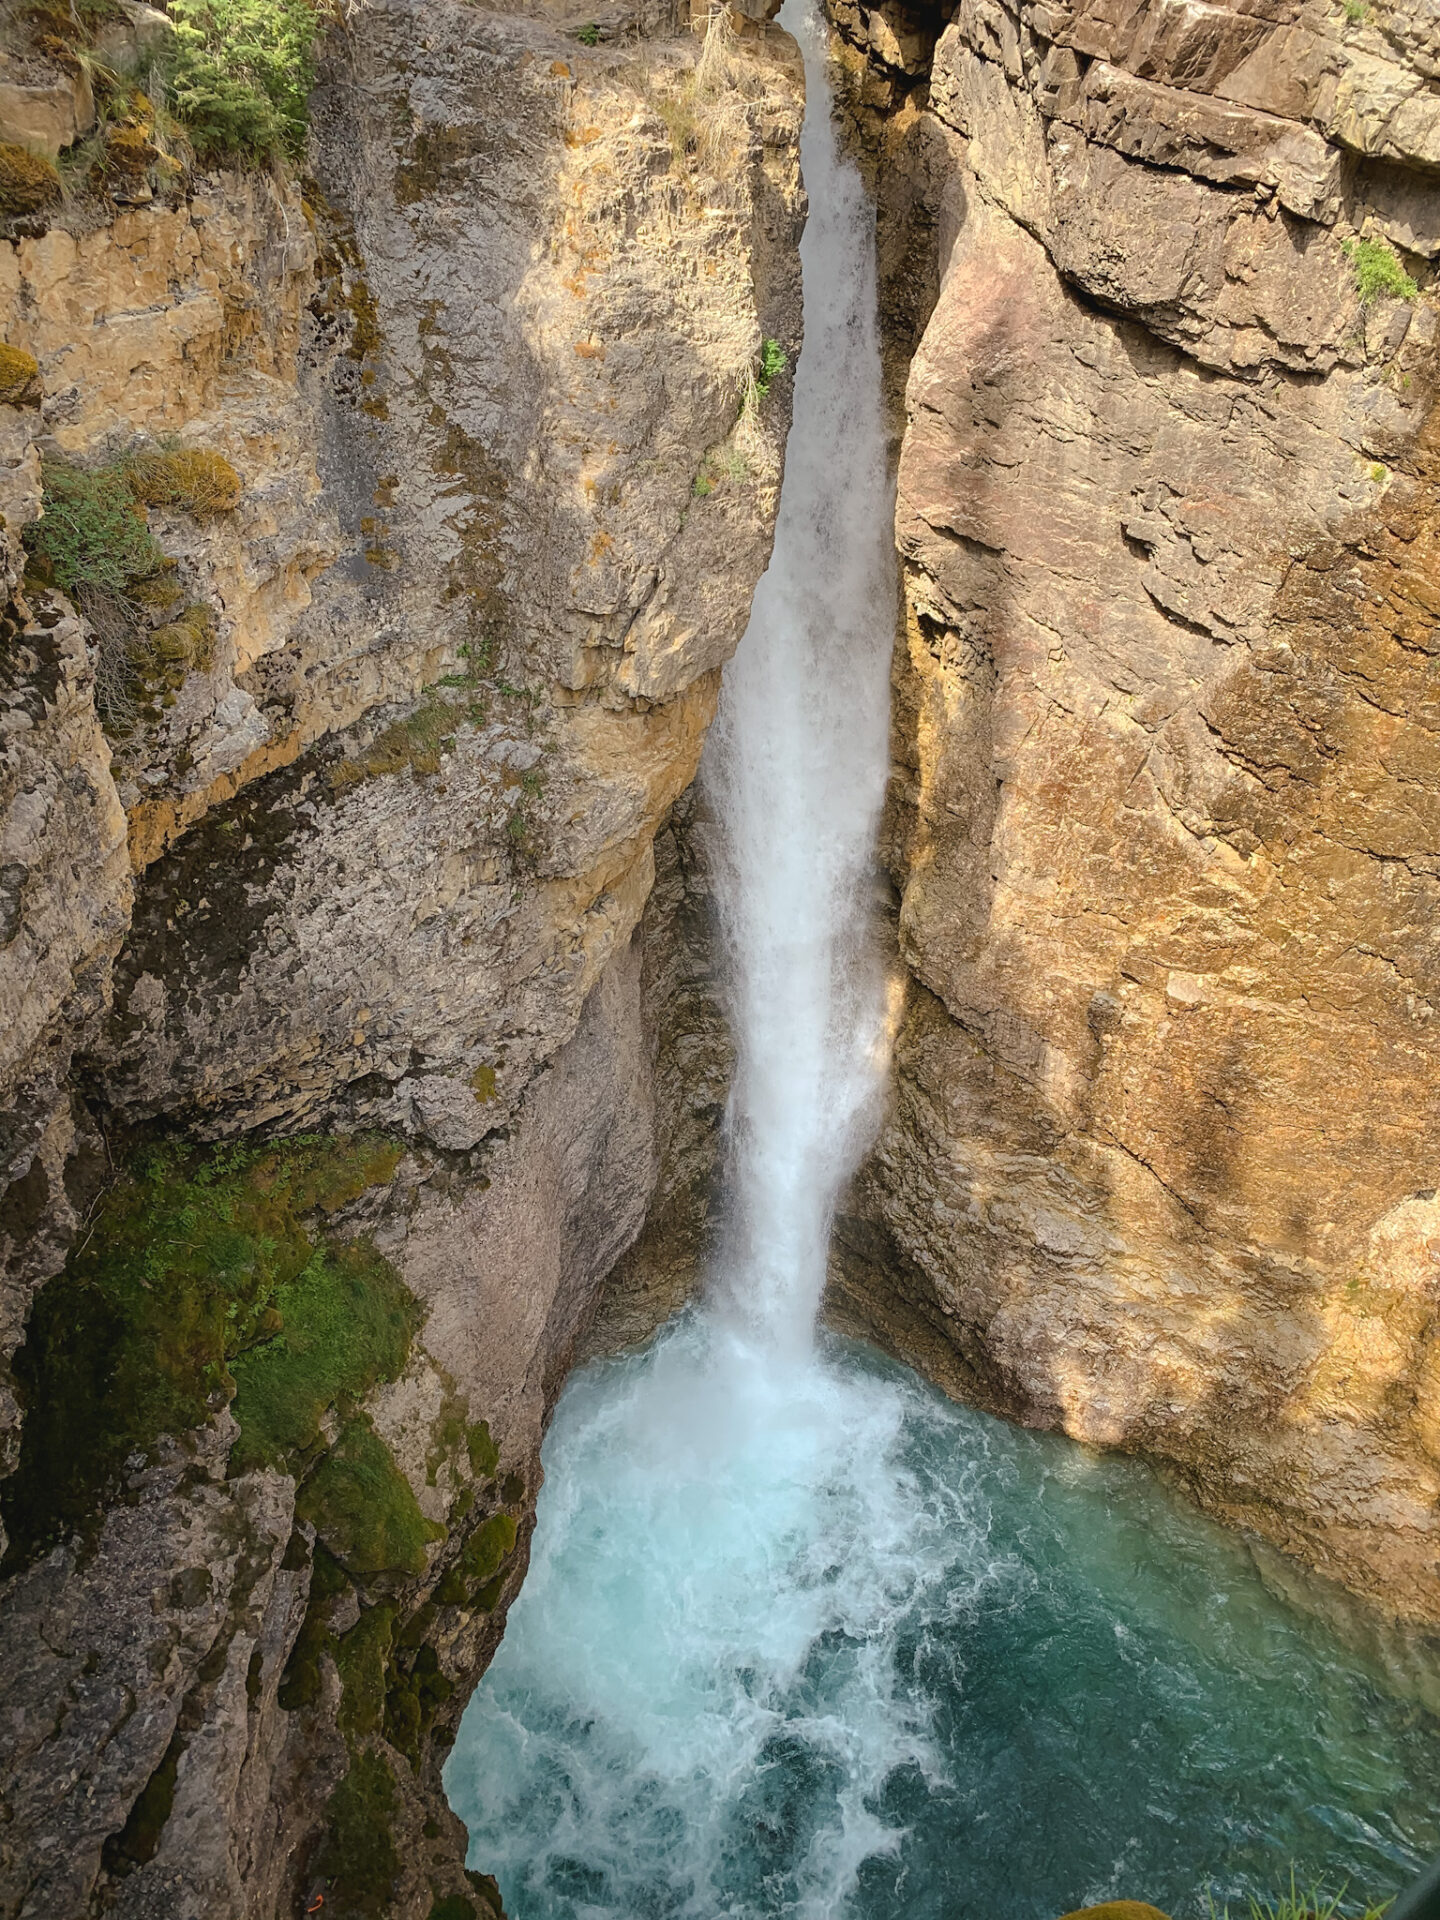 Upper Falls at Johnston Canyon in Banff, Alberta